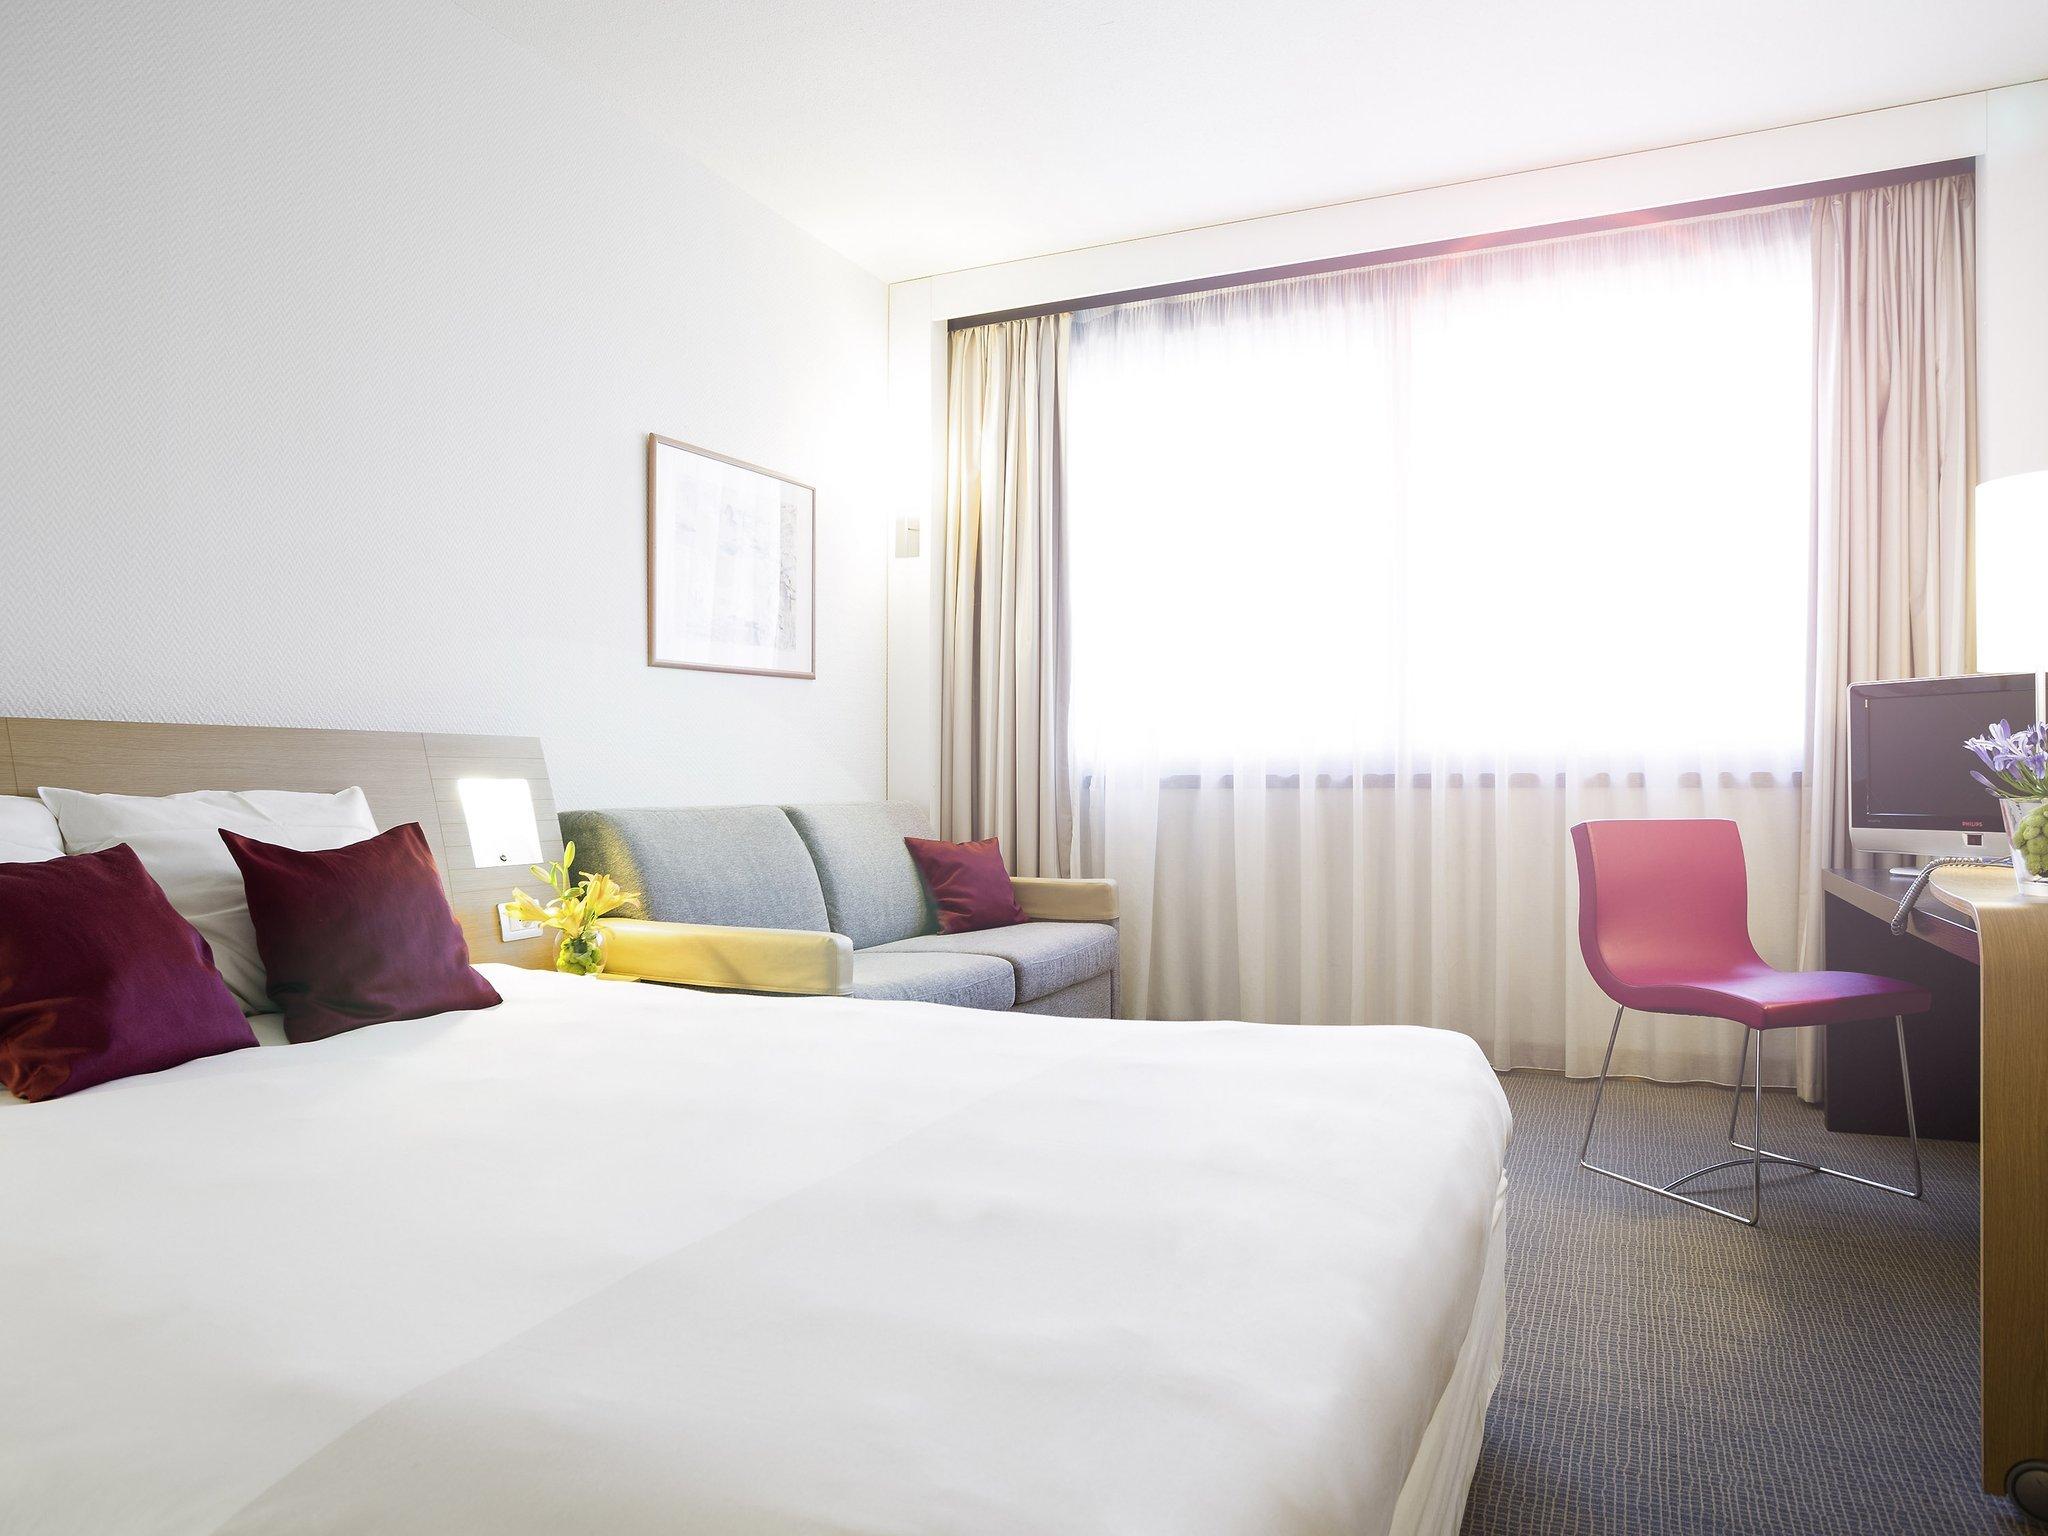 Novotel Genova City Hotel Gªnes Italie voir les tarifs et 445